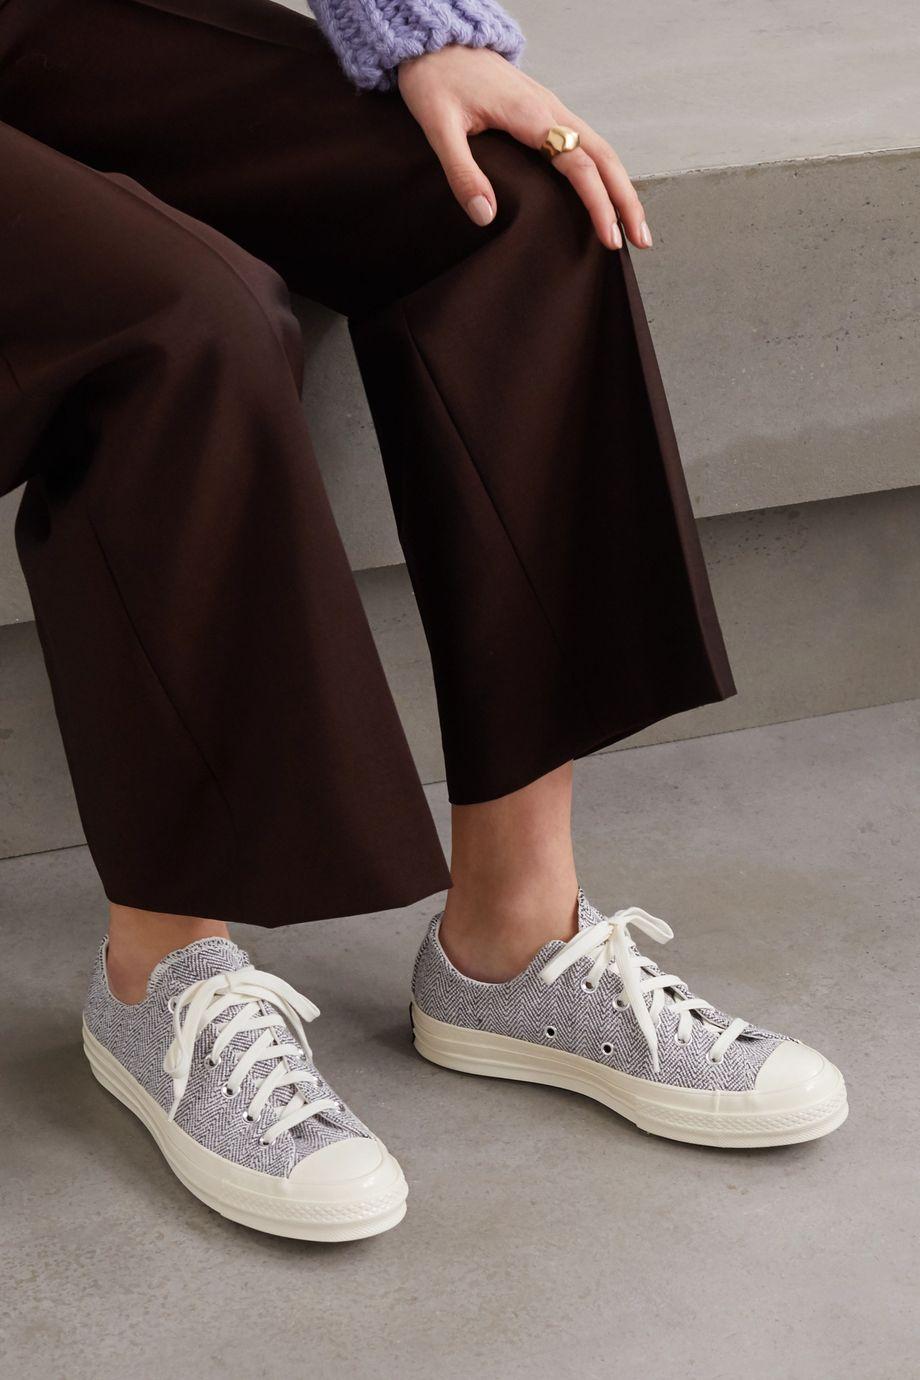 Converse Chuck 70 herringbone canvas sneakers